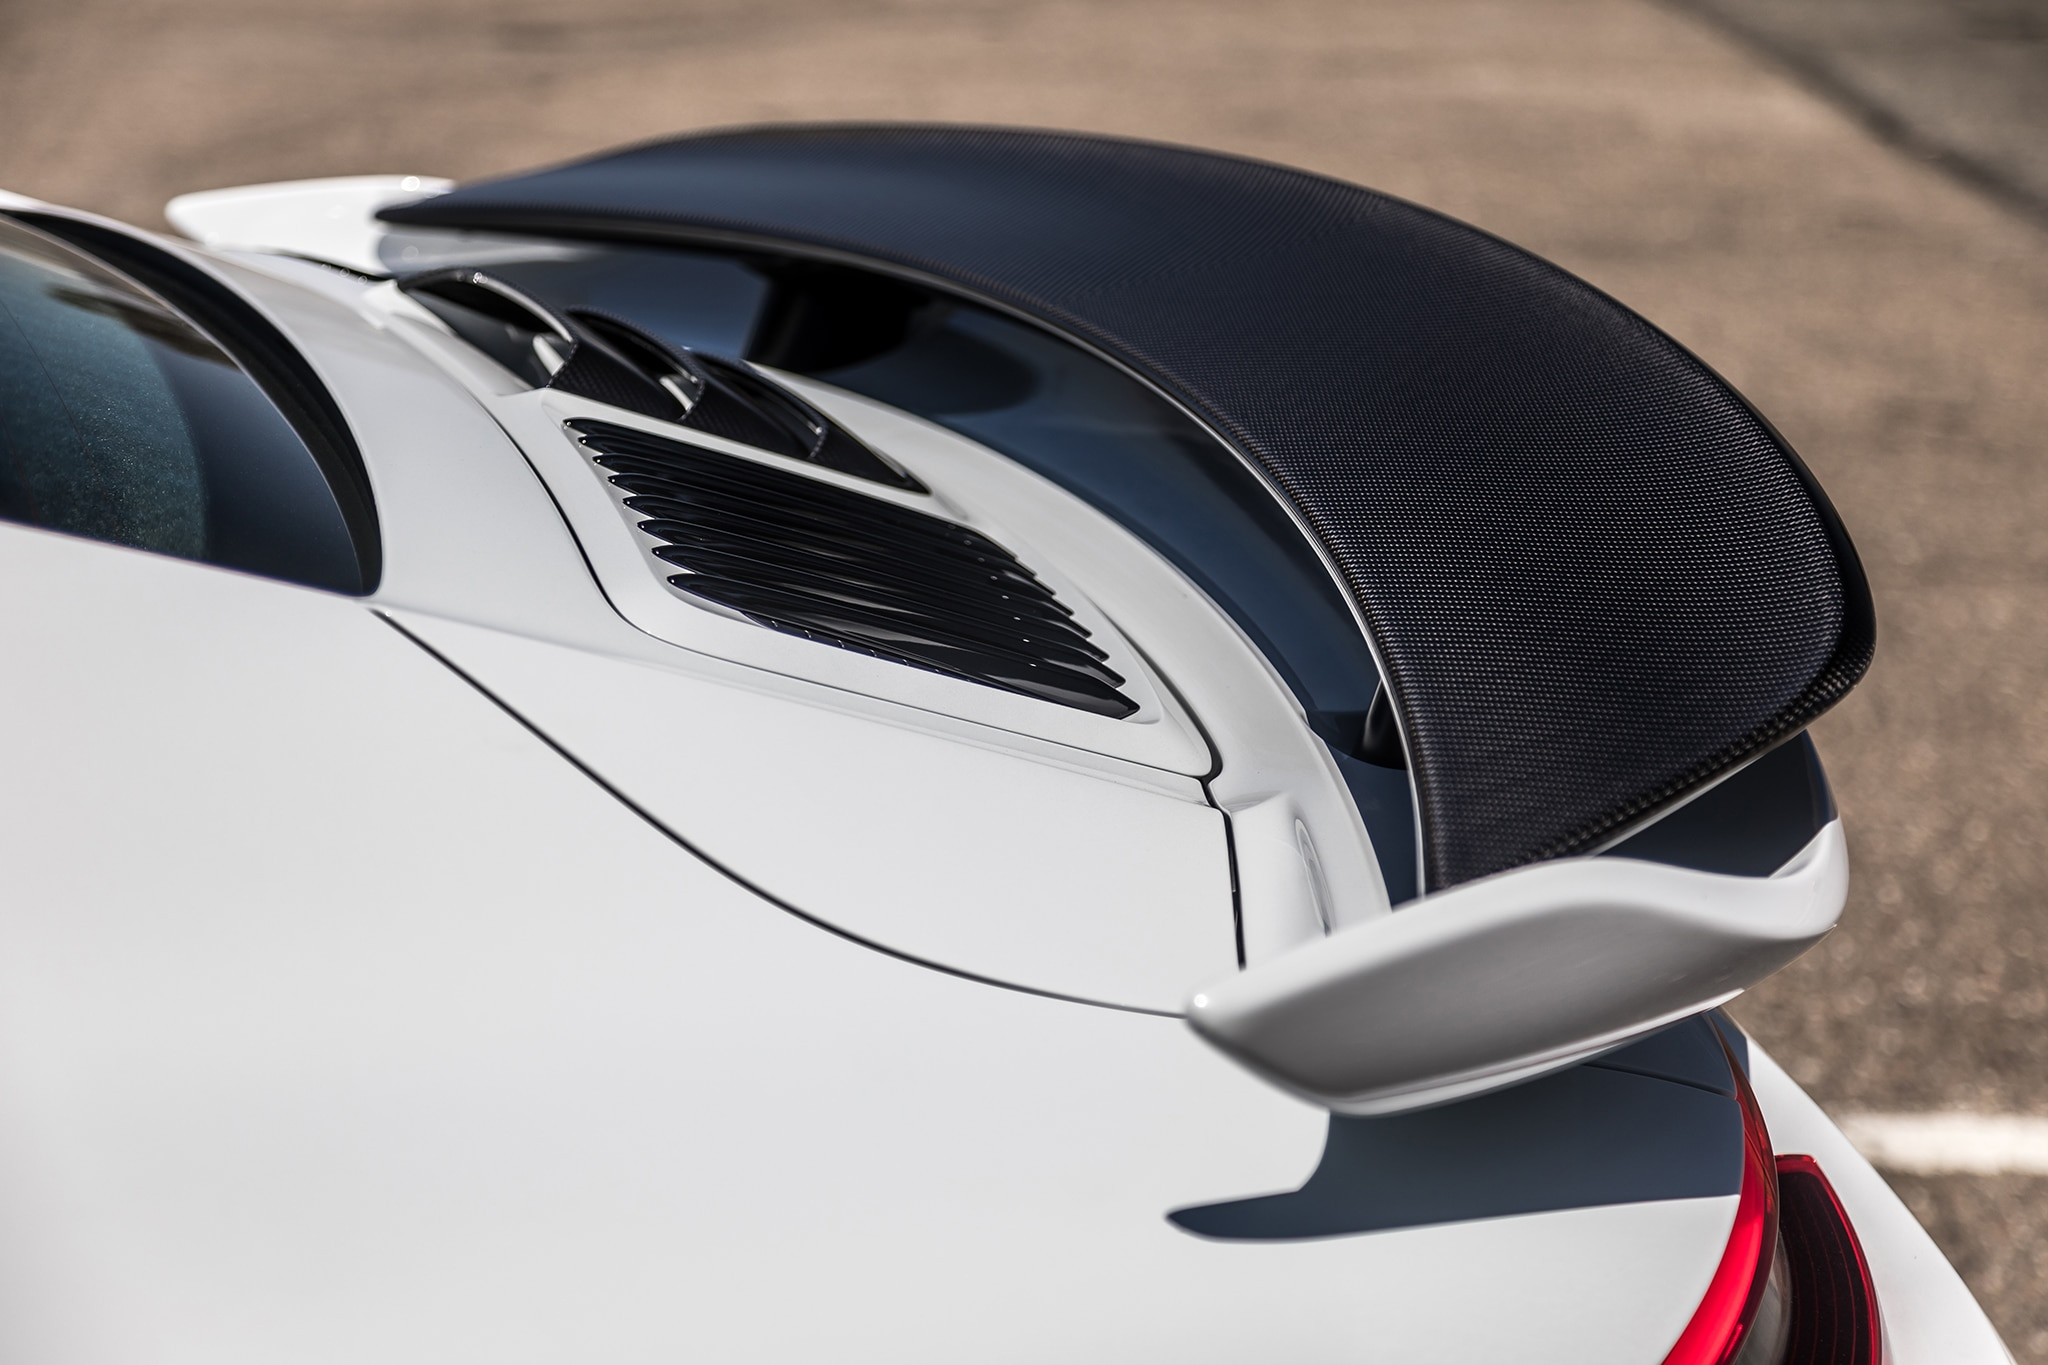 2018 Porsche 911 Turbo S Exclusive Rear Spoiler 01